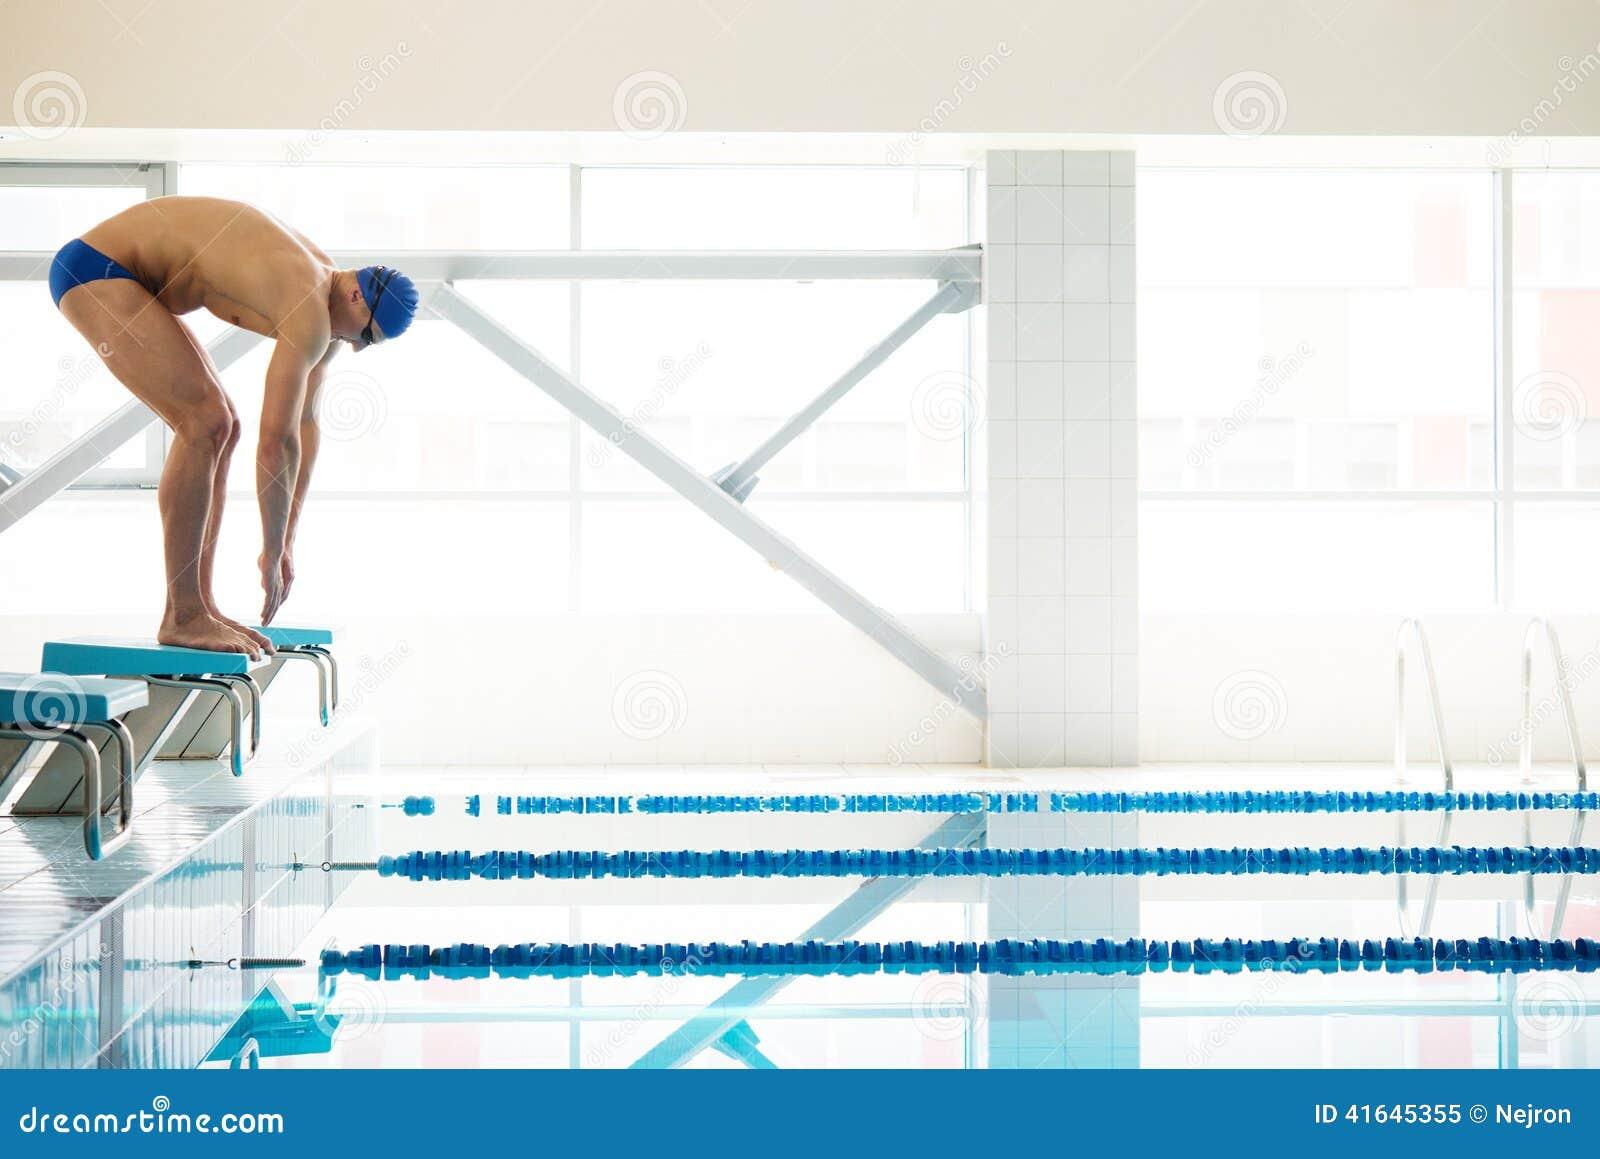 swimmer standing on starting block stock photo image 41645355. Black Bedroom Furniture Sets. Home Design Ideas